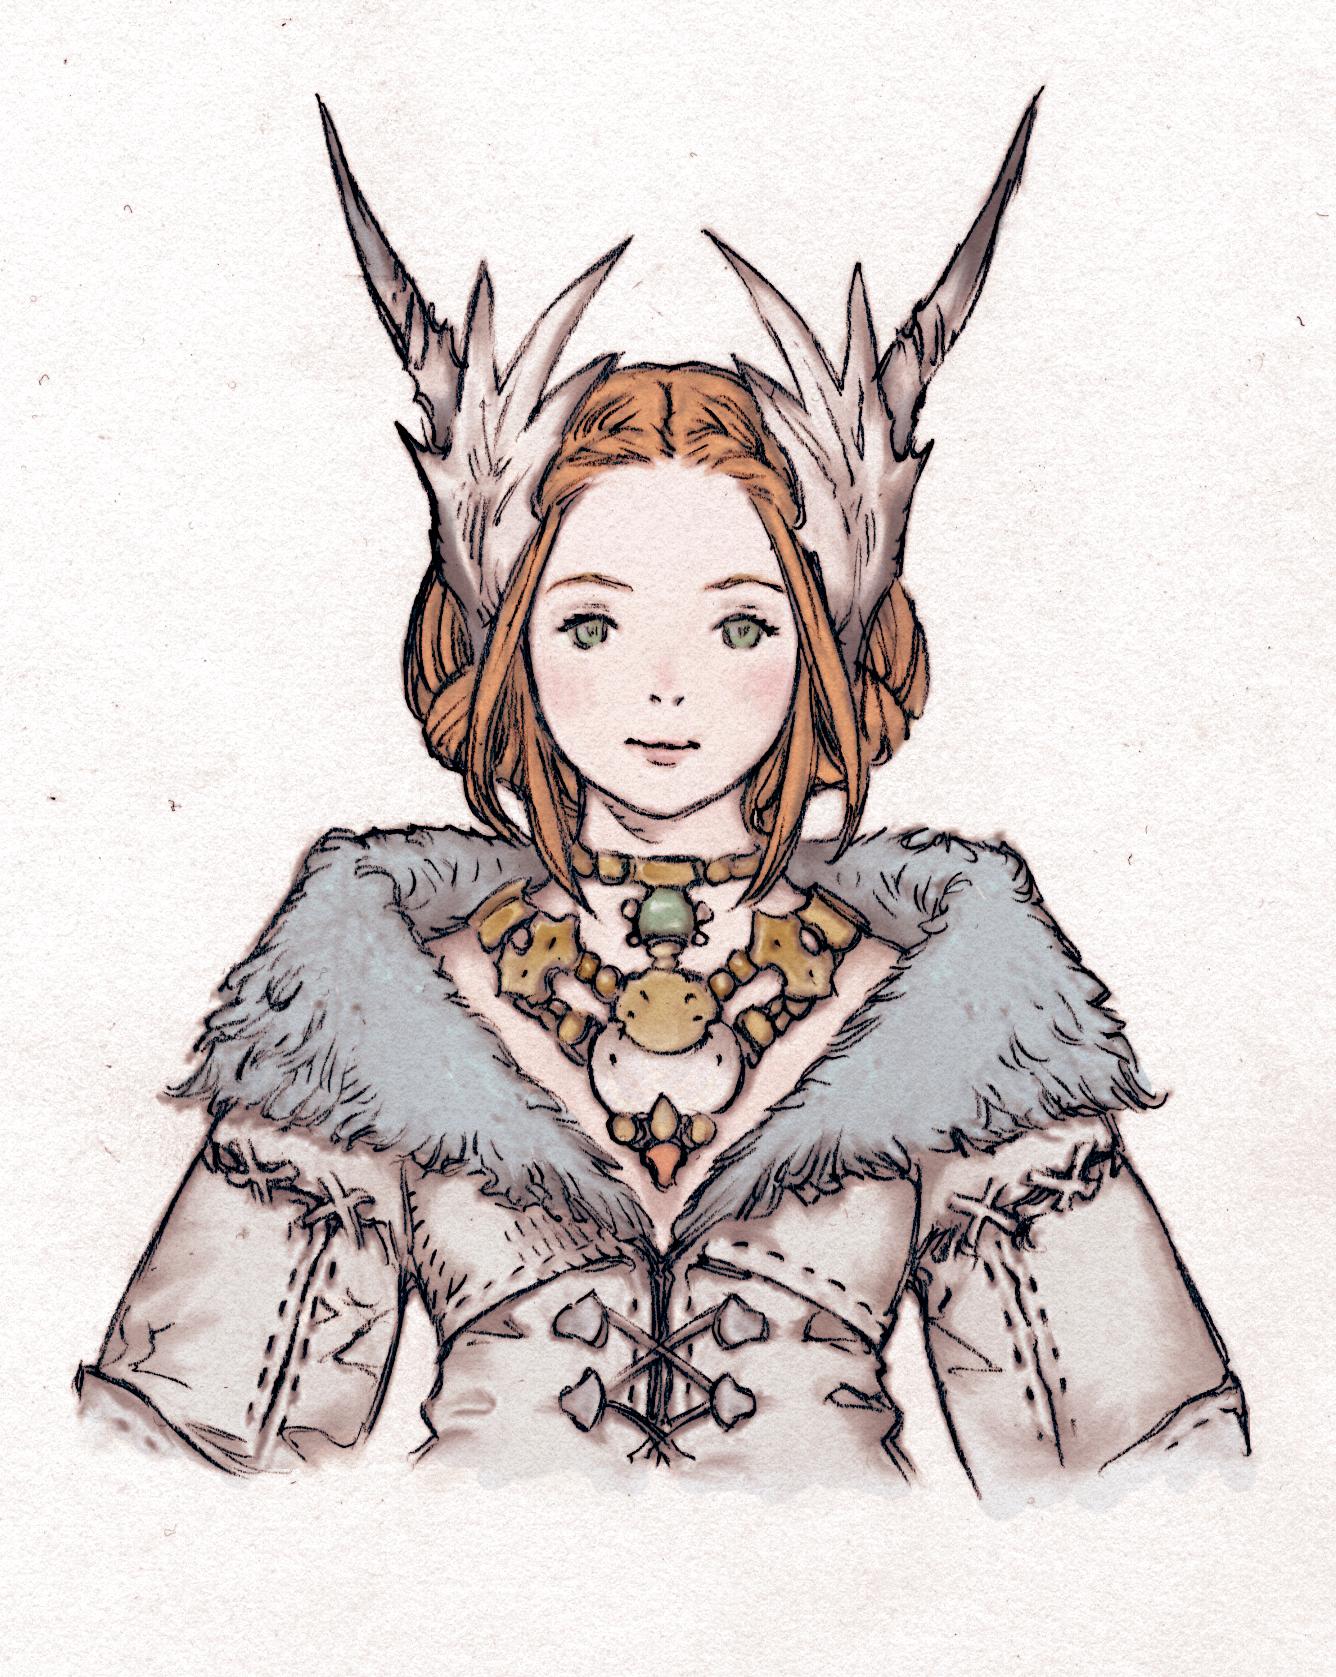 Voice Of Kan-E-Senna - Final Fantasy | Behind The Voice Actors